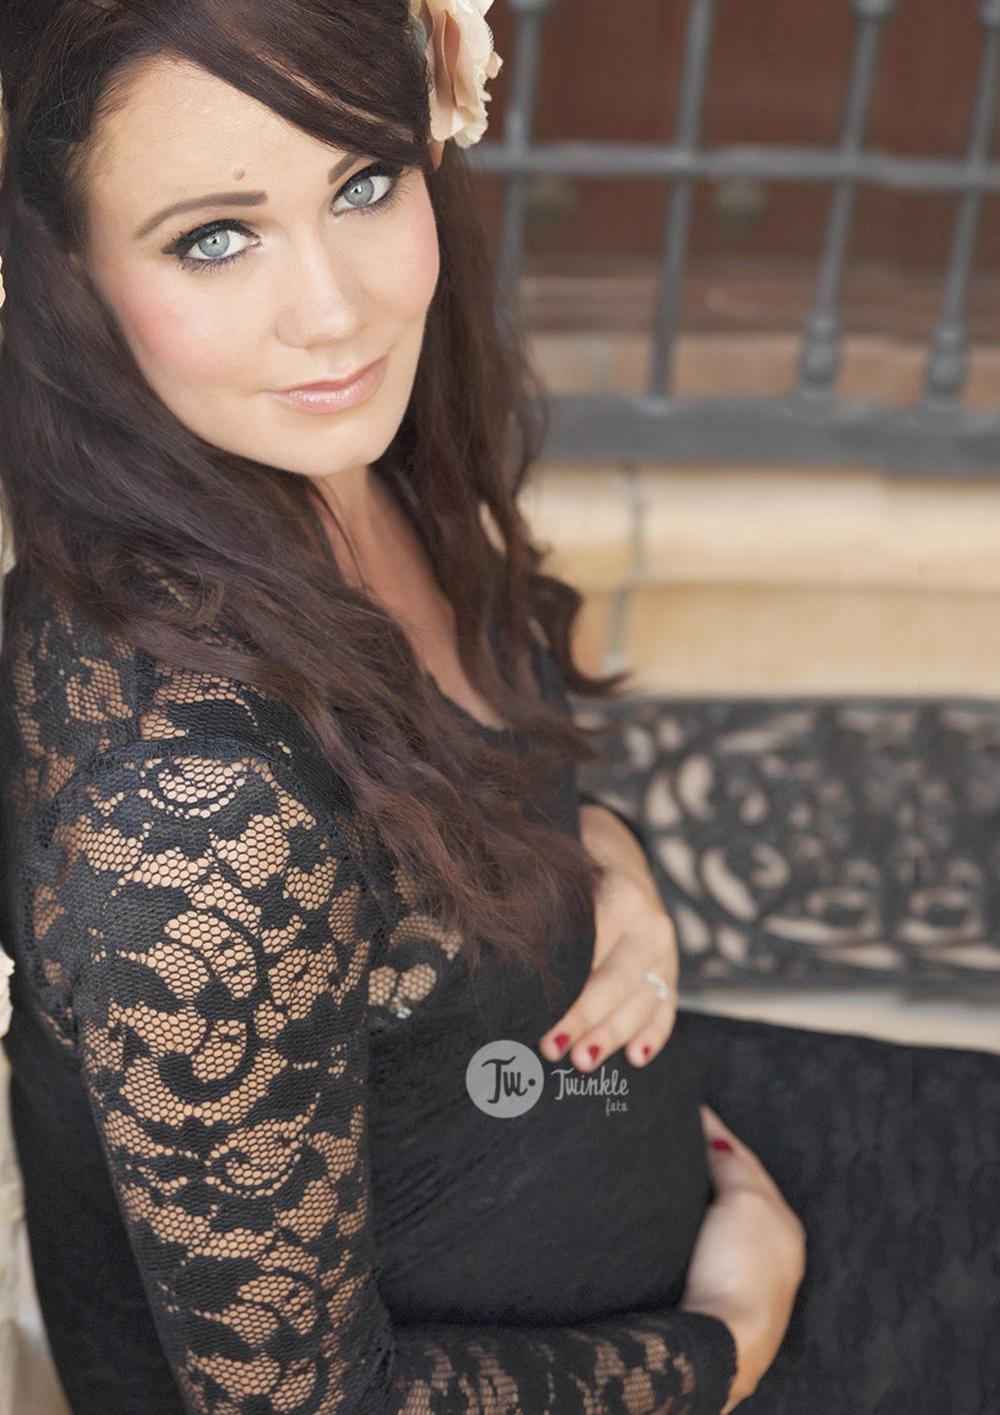 foto embarazada valencia jessica14419